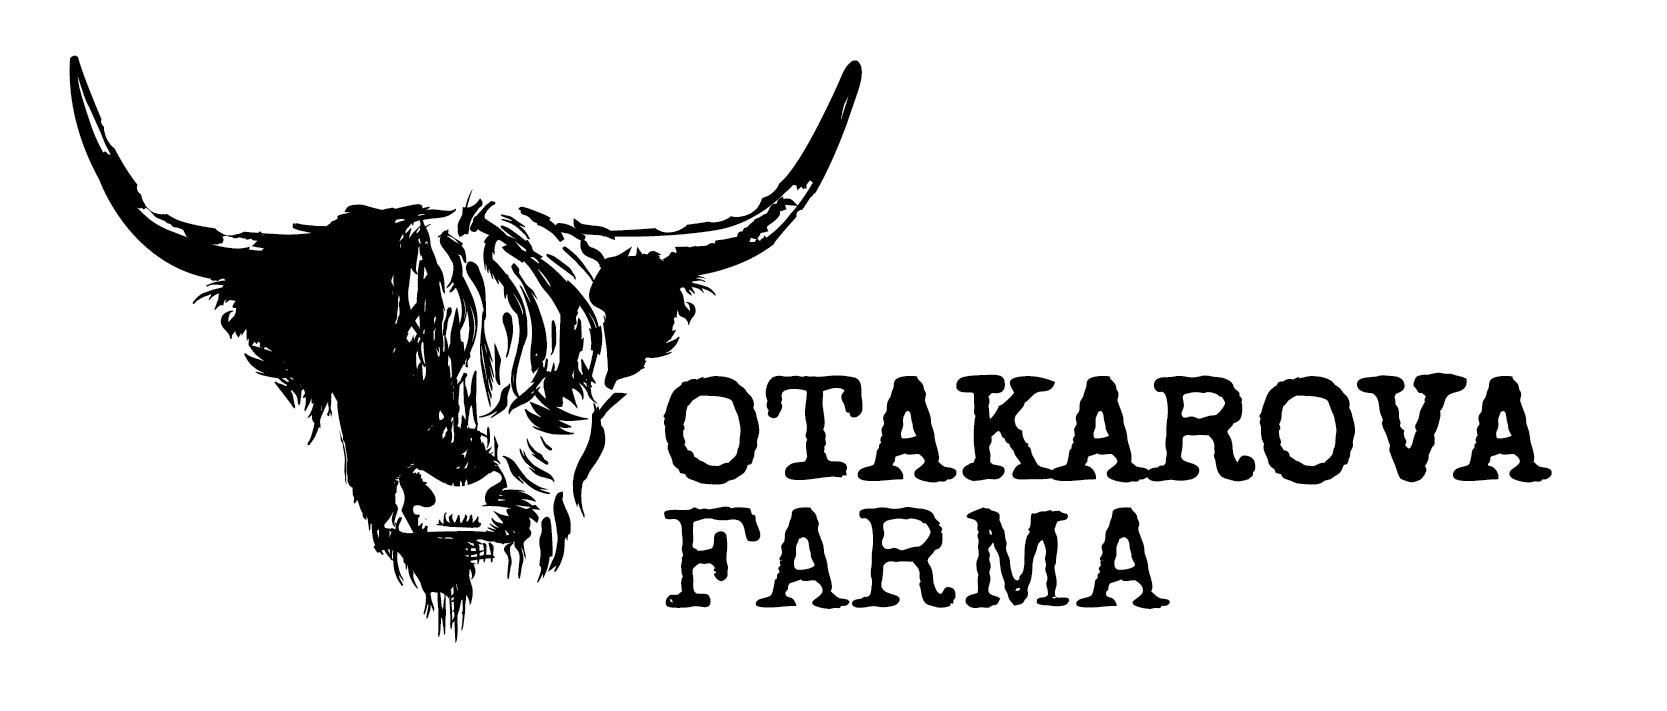 Otakarova farma